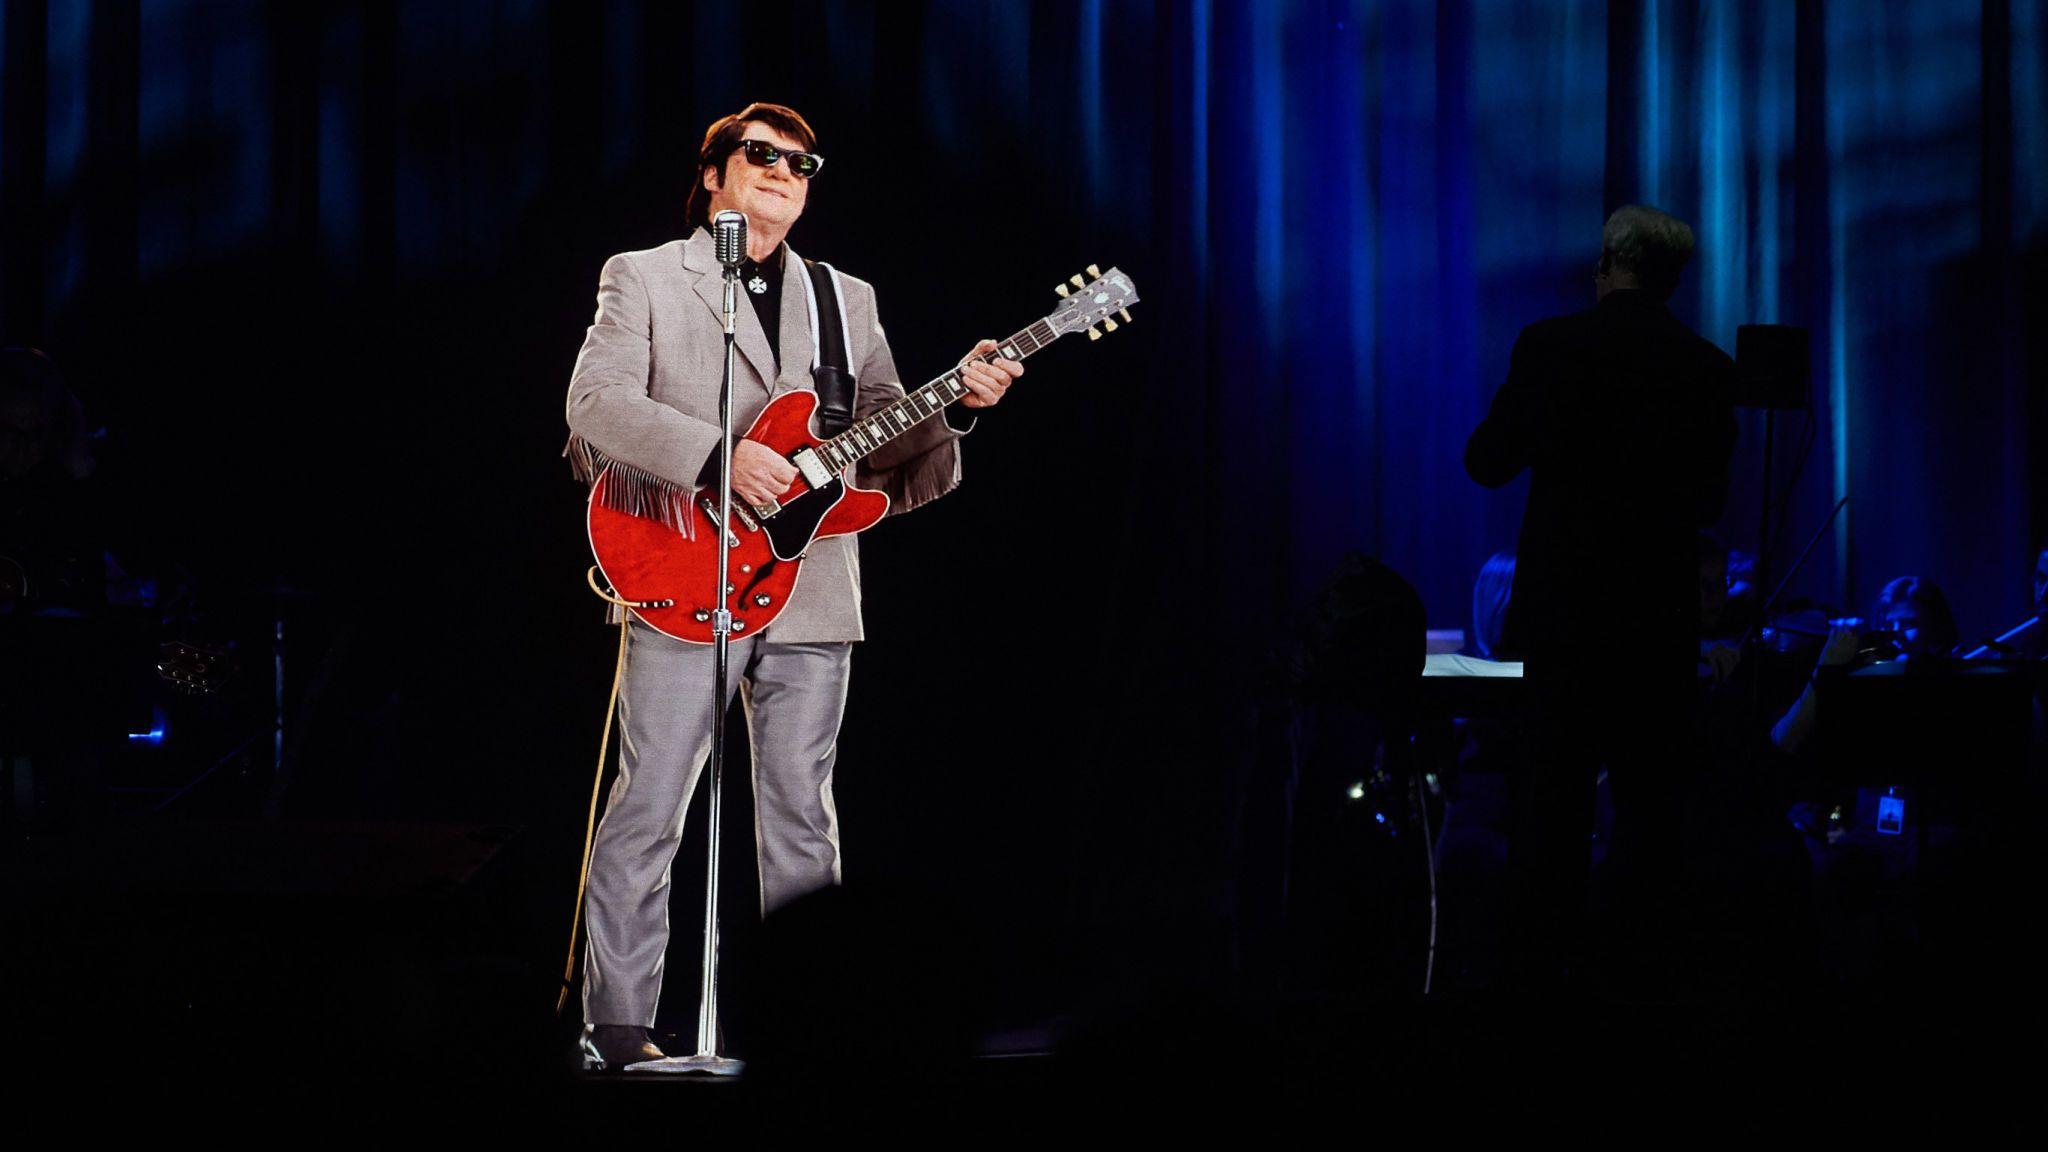 Roy Orbison's hologram went on tour in 2018